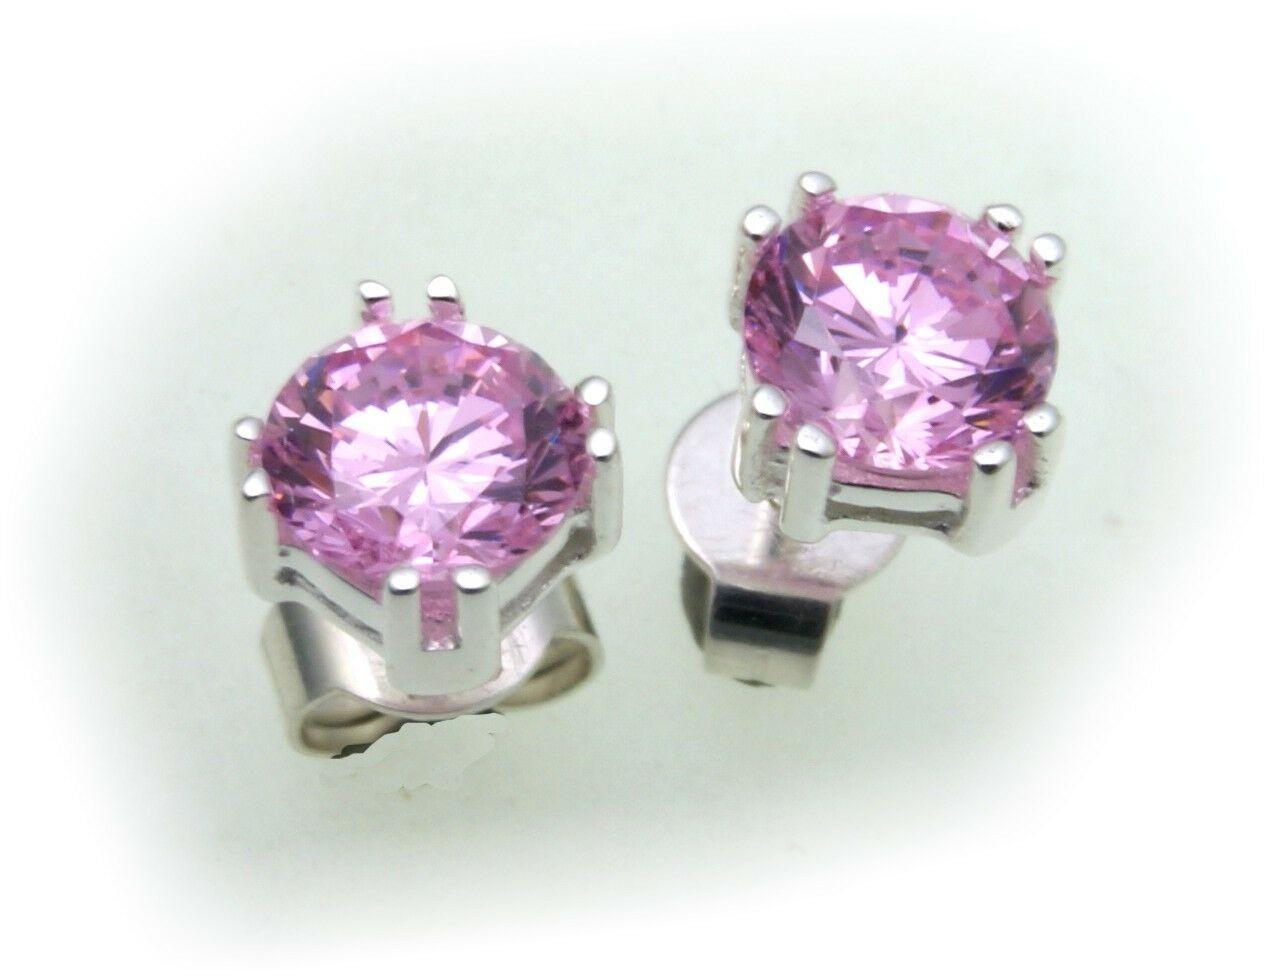 Damen Ohrringe rund 7mm Zirkonia pink echt Silber 925 Sterlingsilber Ohrstecker